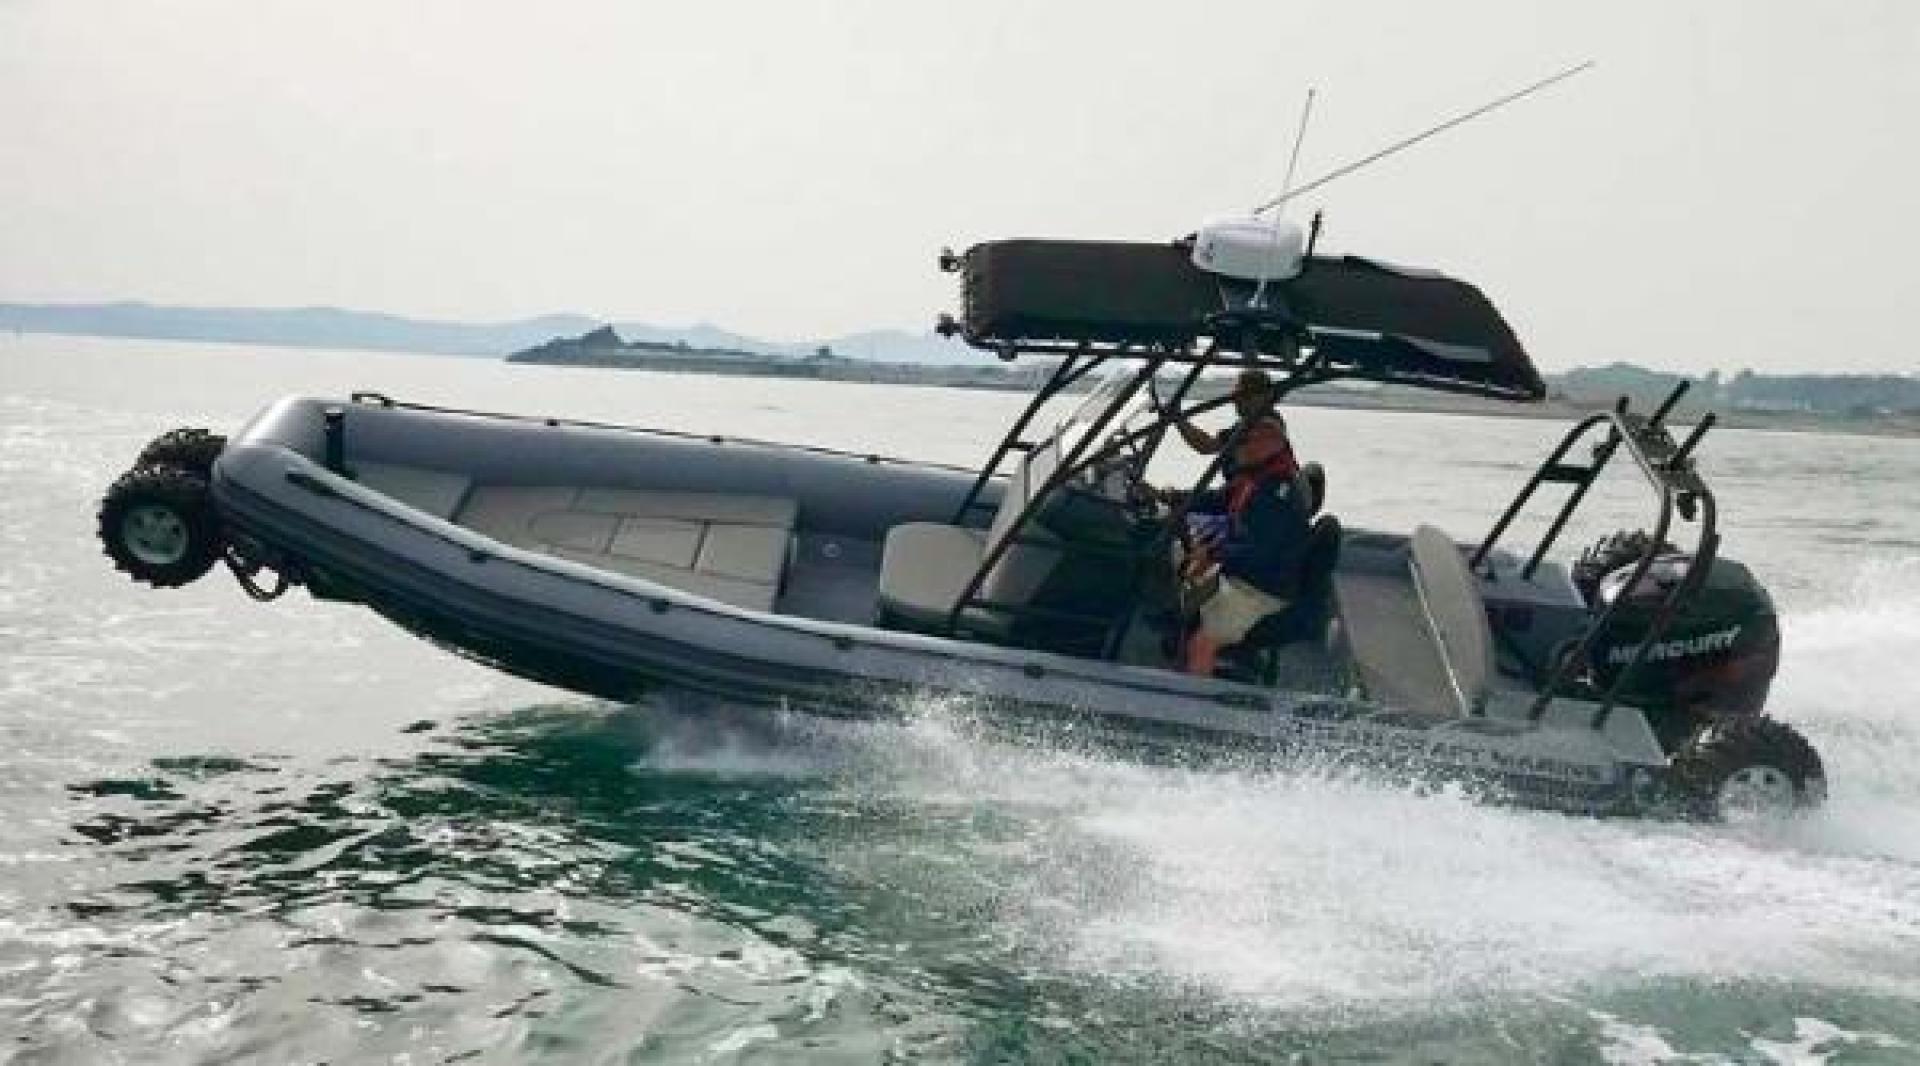 Ocean Craft Marine-8.4 M Amphibious 2020-Ocean Craft Marine 8.4 M Amphibious Fort Lauderdale-Florida-United States-1523044 | Thumbnail